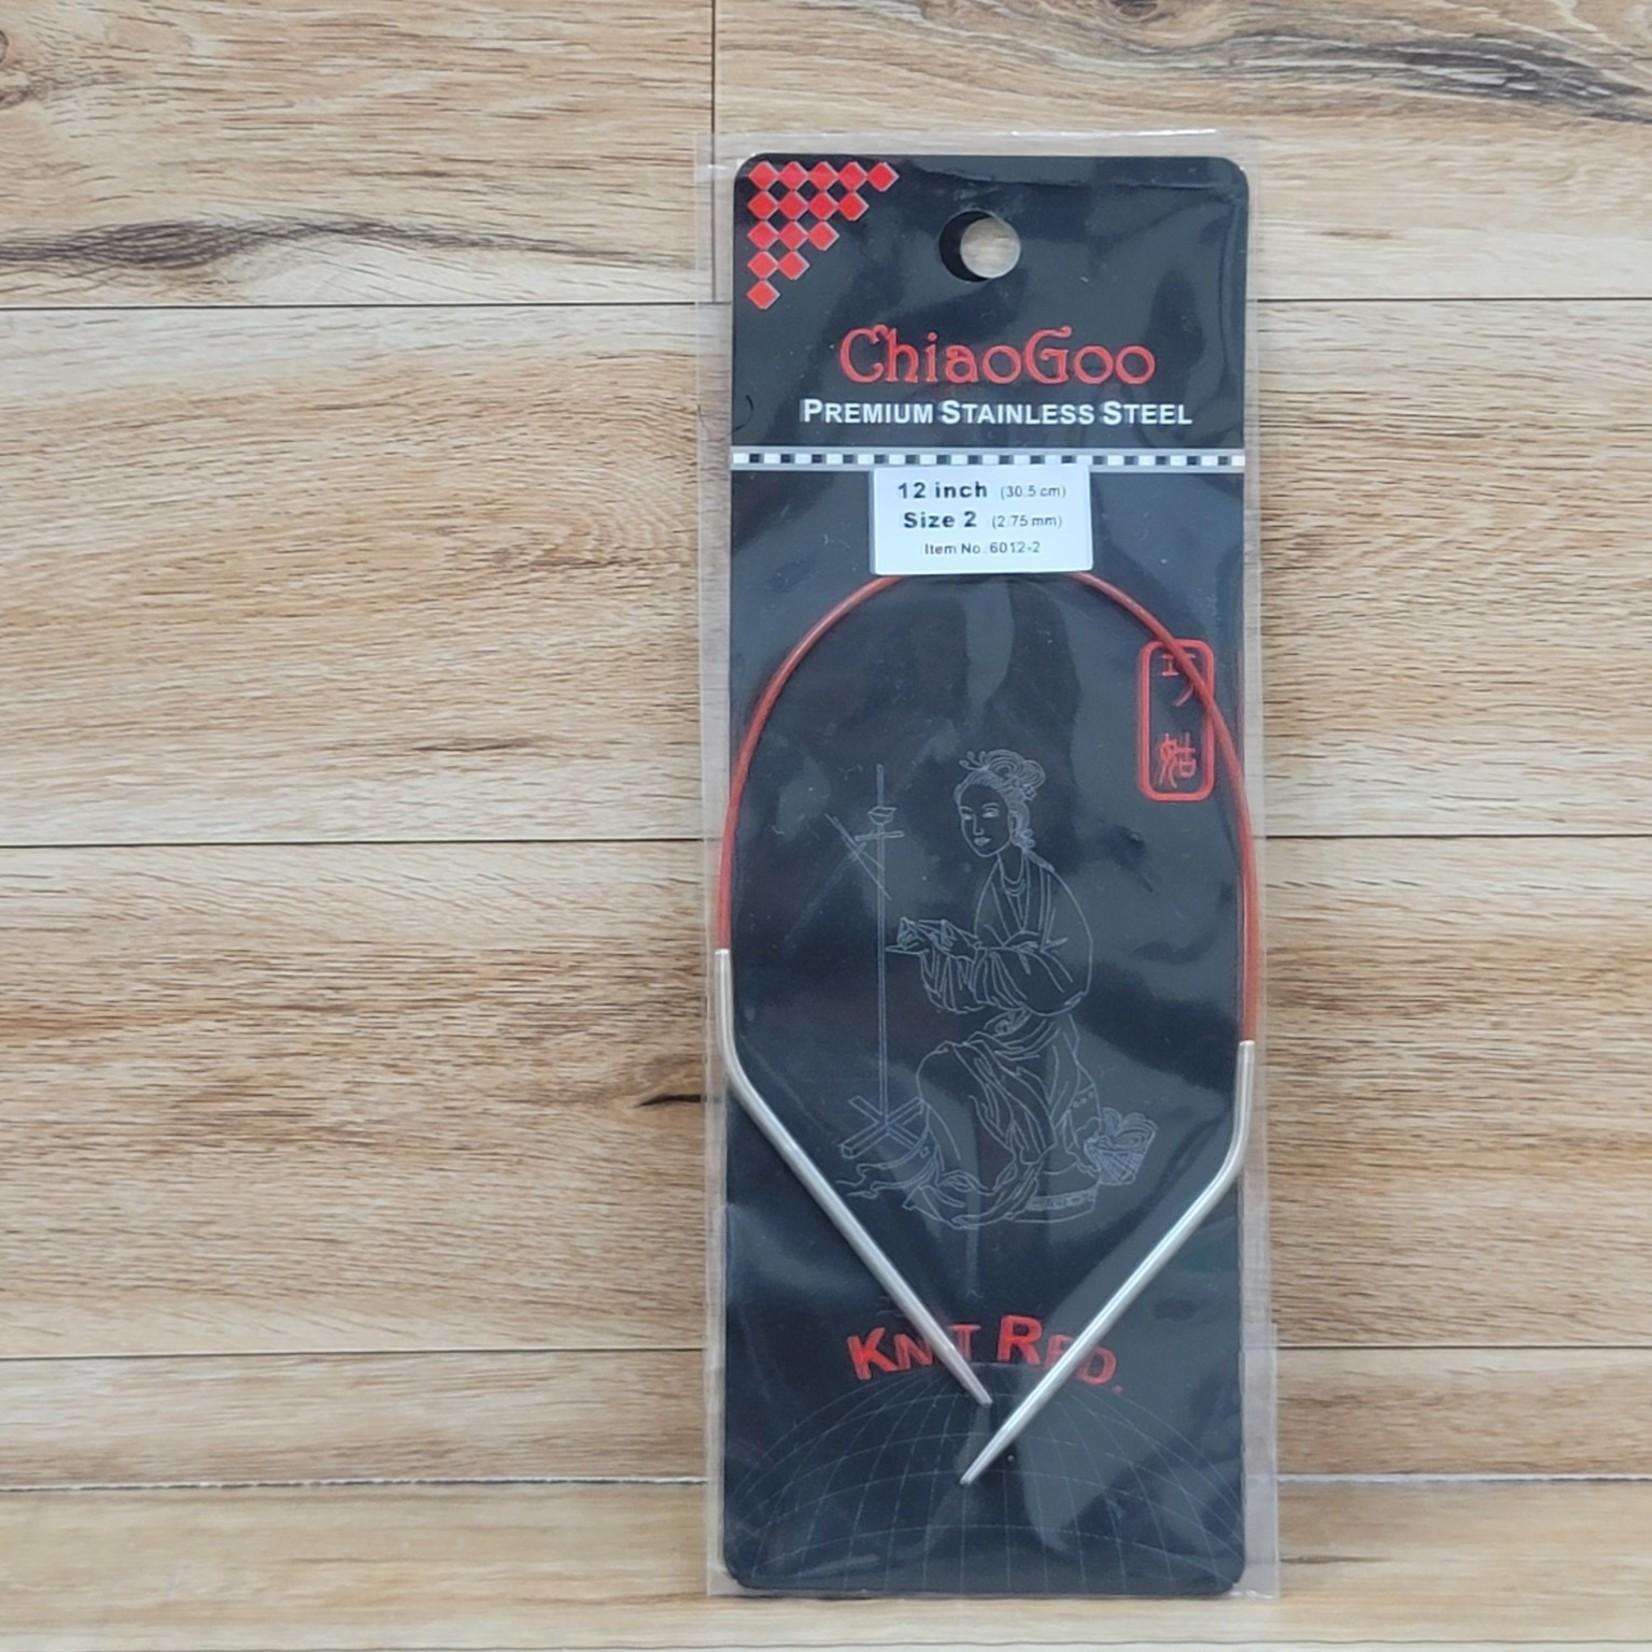 ChiaoGoo - Red Circular Knitting Needles - 12 inch Size 2 (2.75mm)